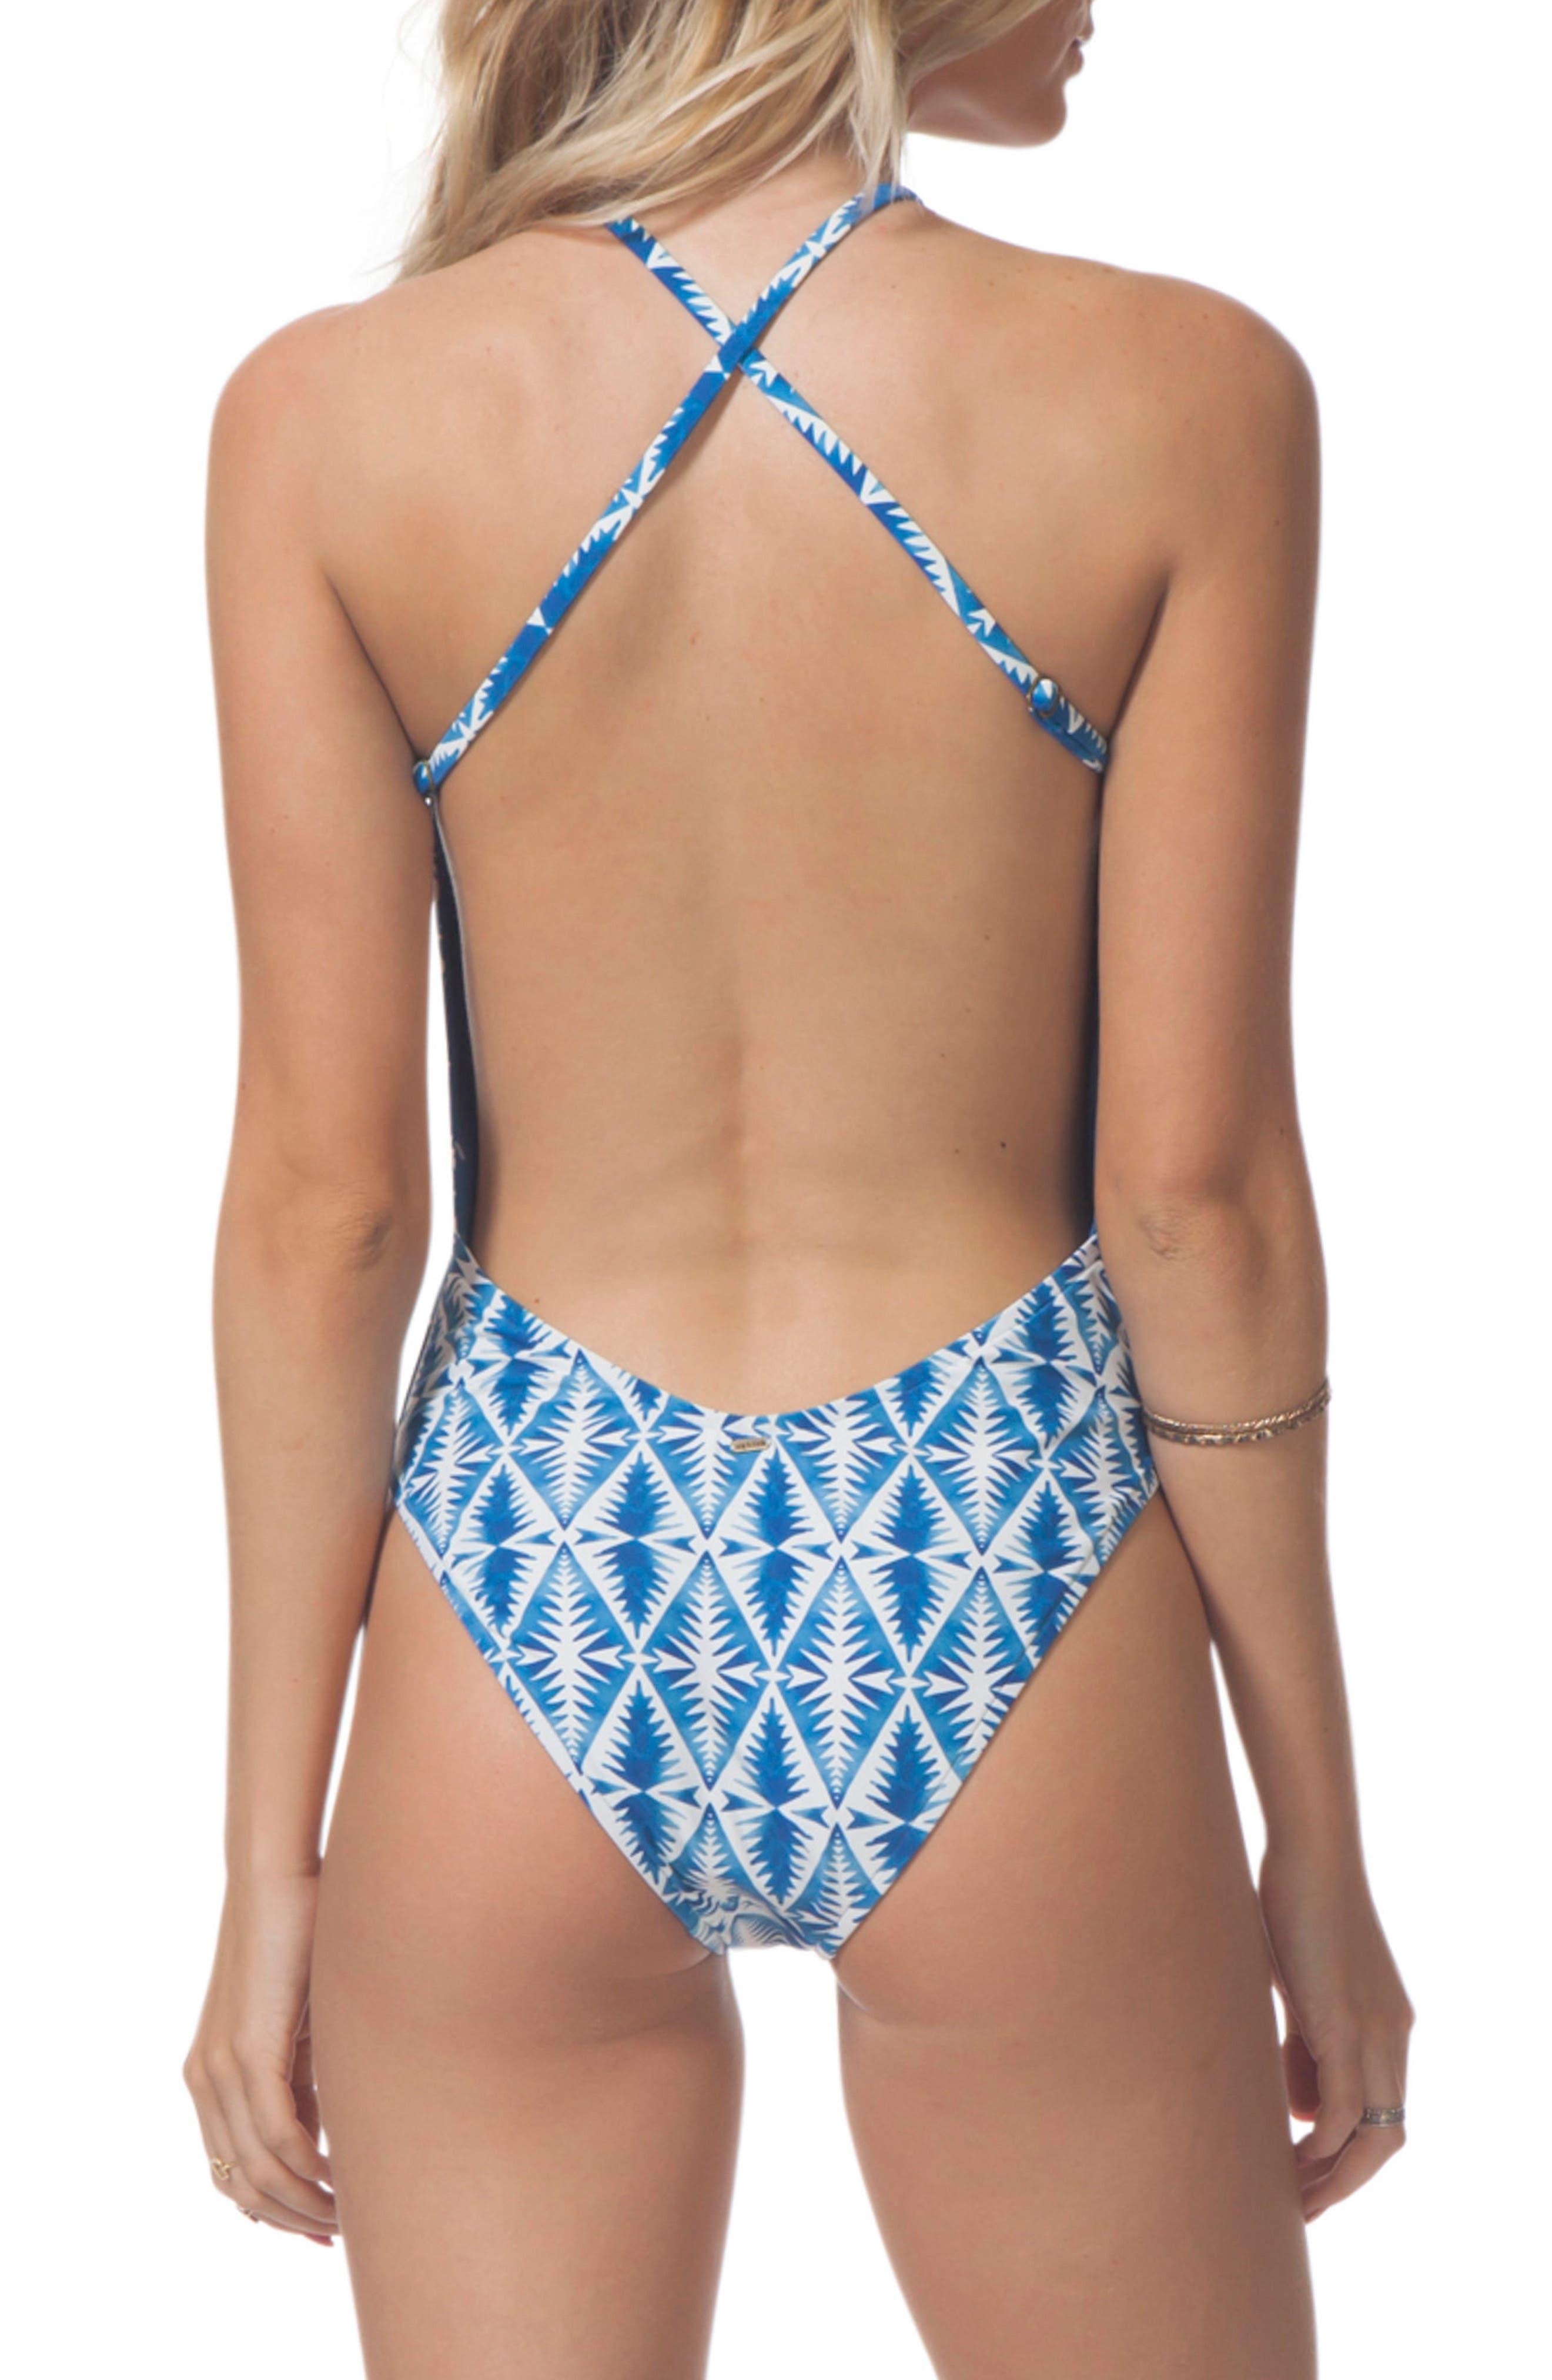 Beach Bazaar One-Piece Swimsuit,                             Alternate thumbnail 2, color,                             Blue